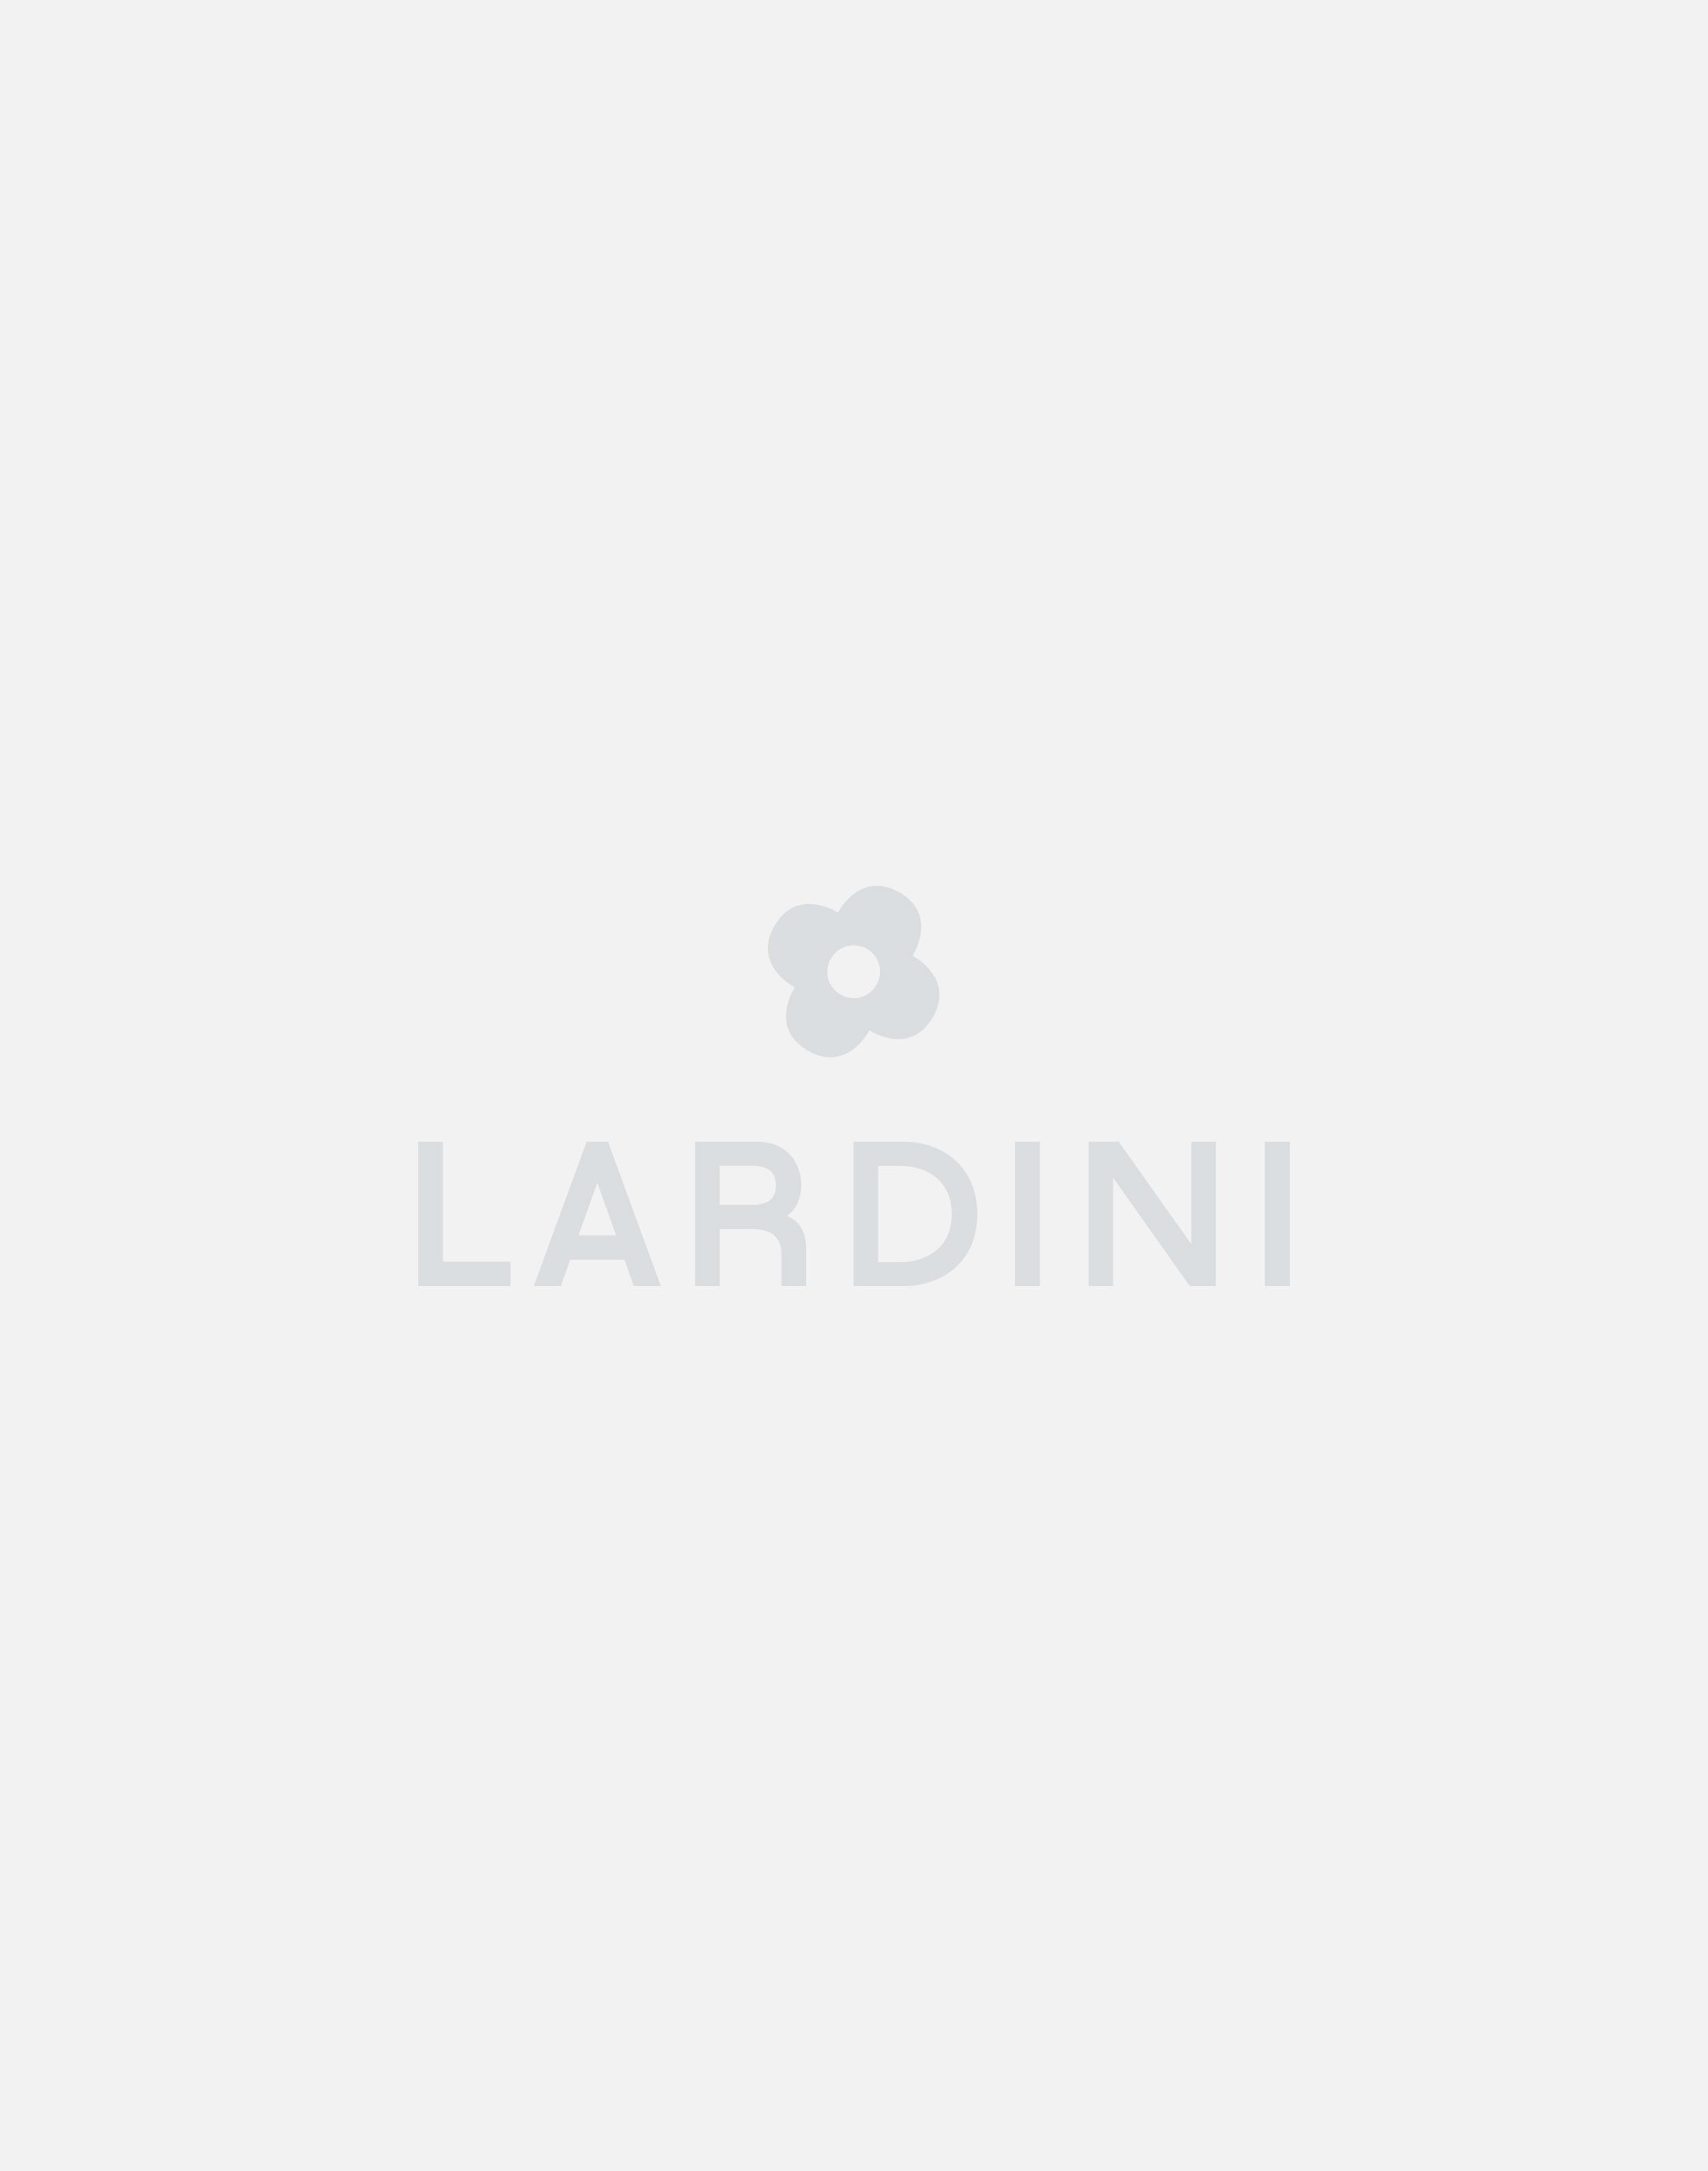 Dalle origini a oggi | Lardini